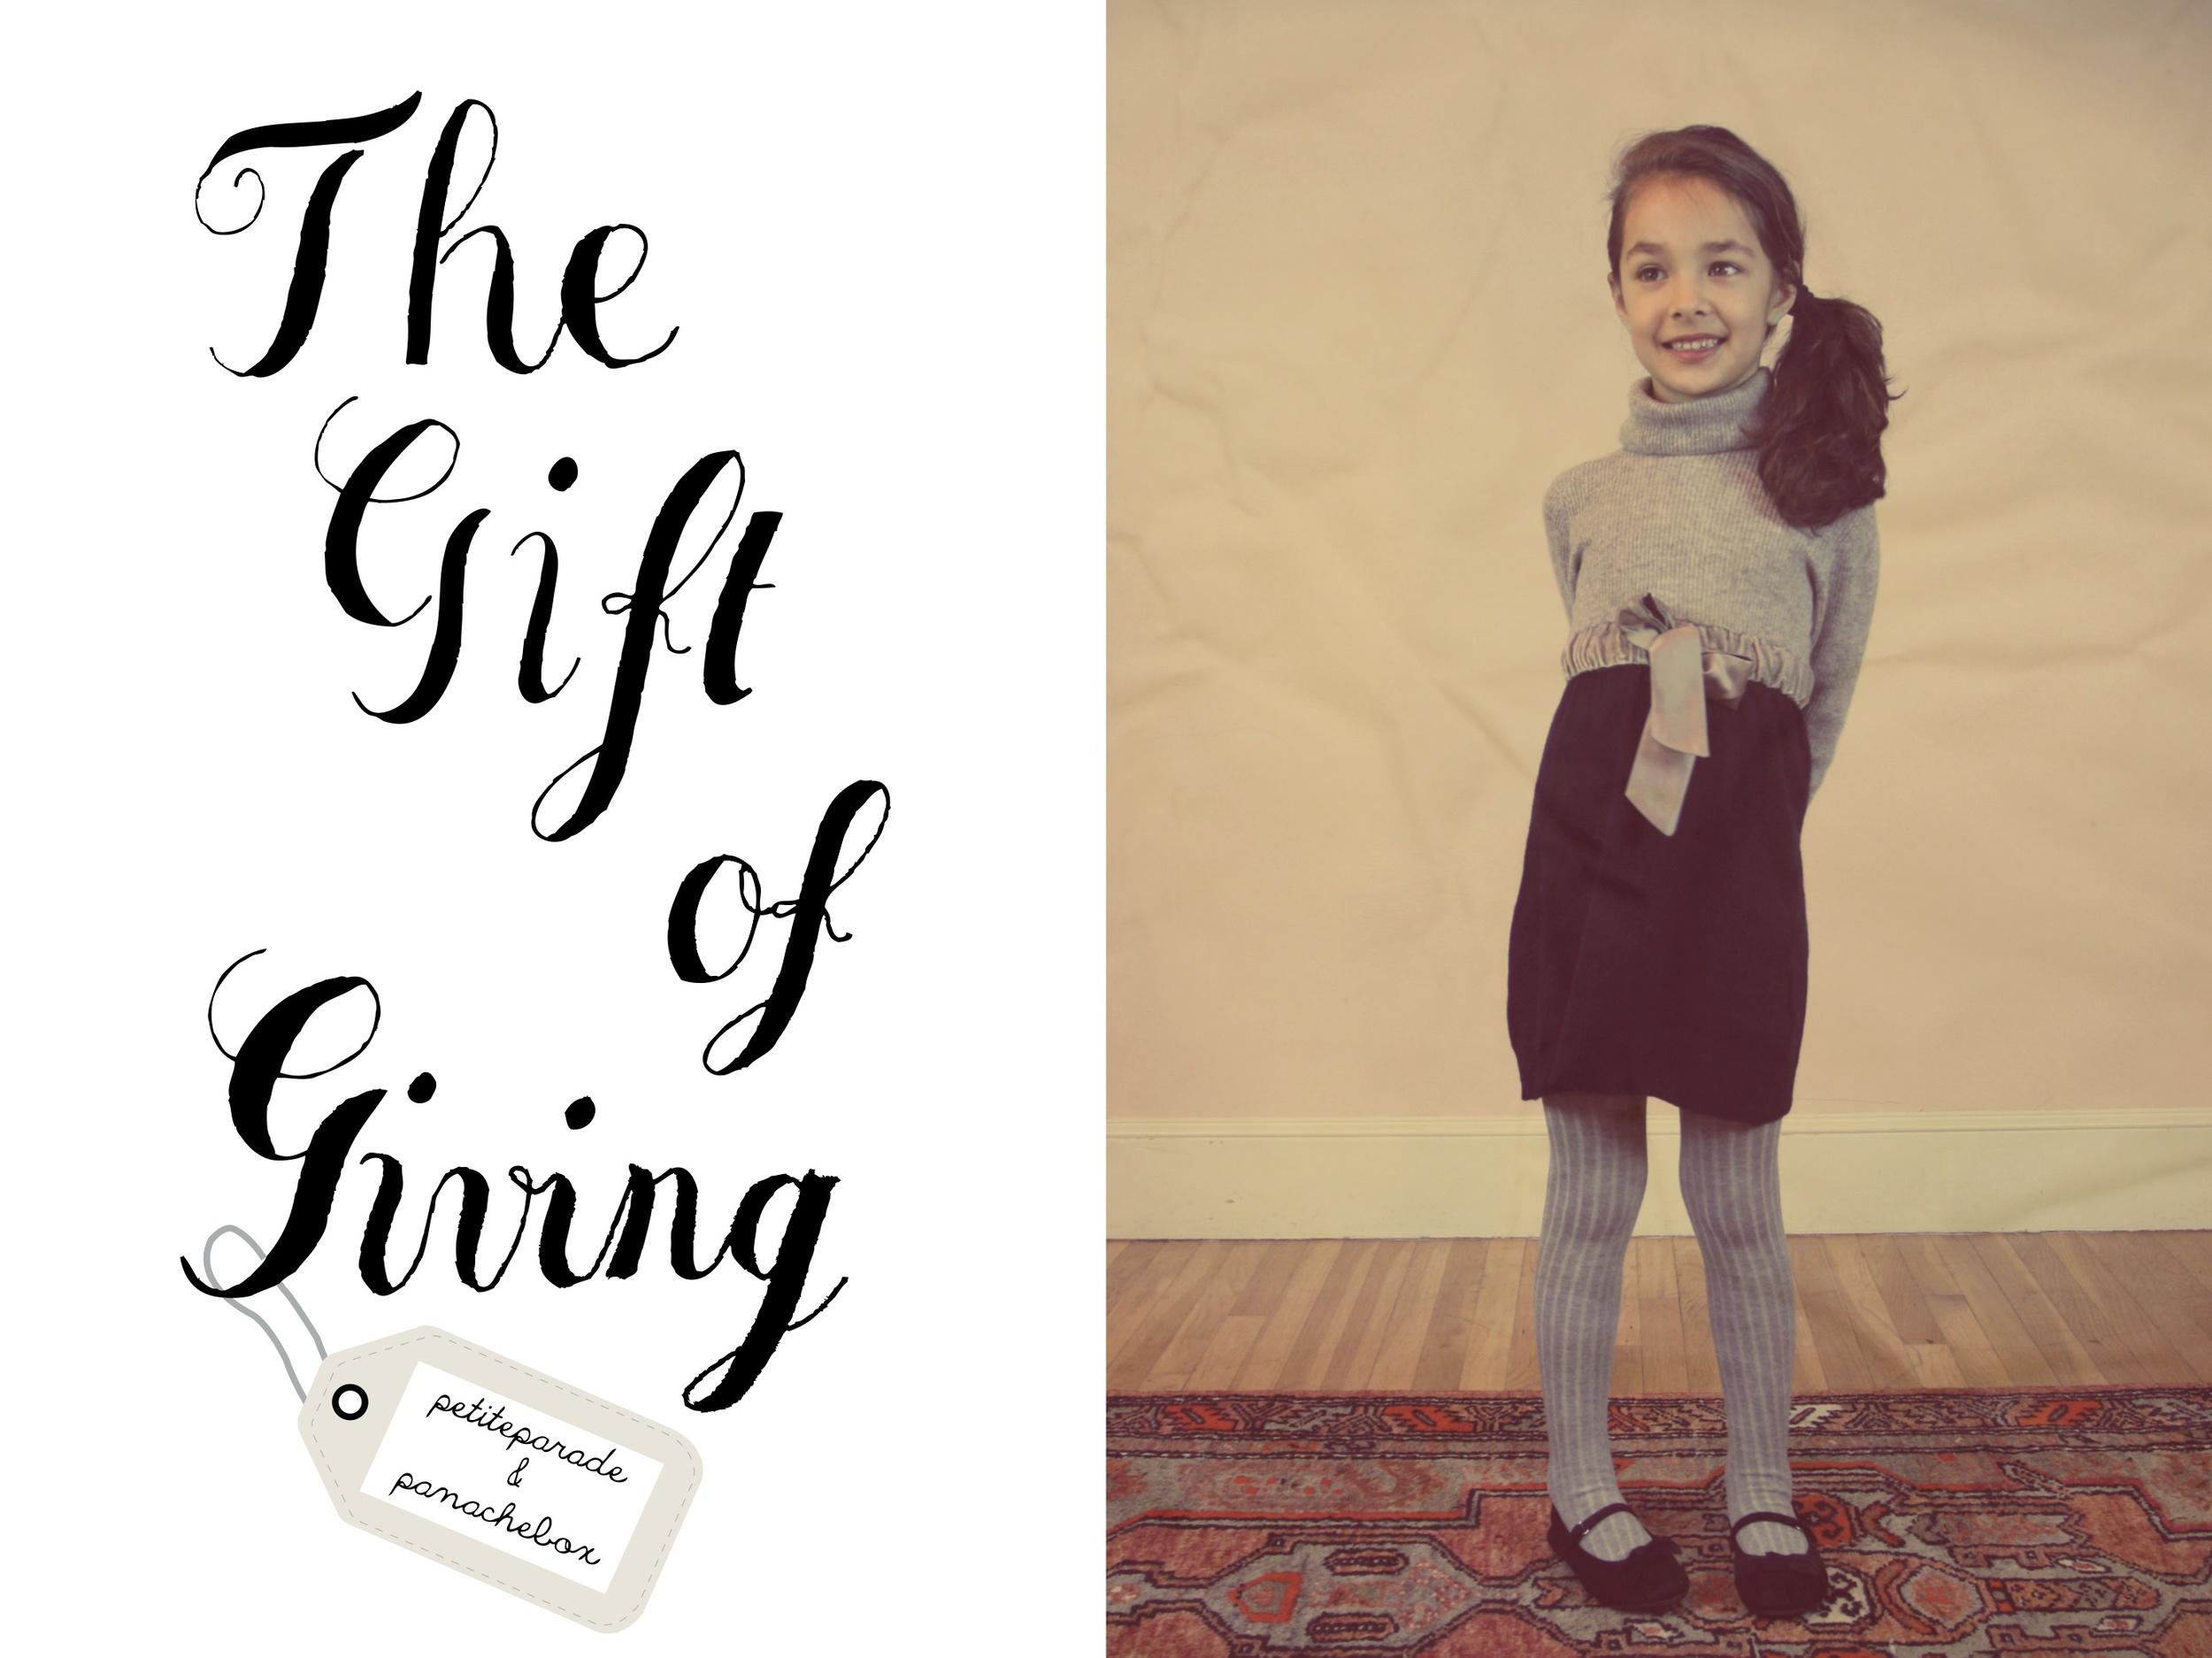 pb-x-pP-gift-of-giving2-copy.jpg